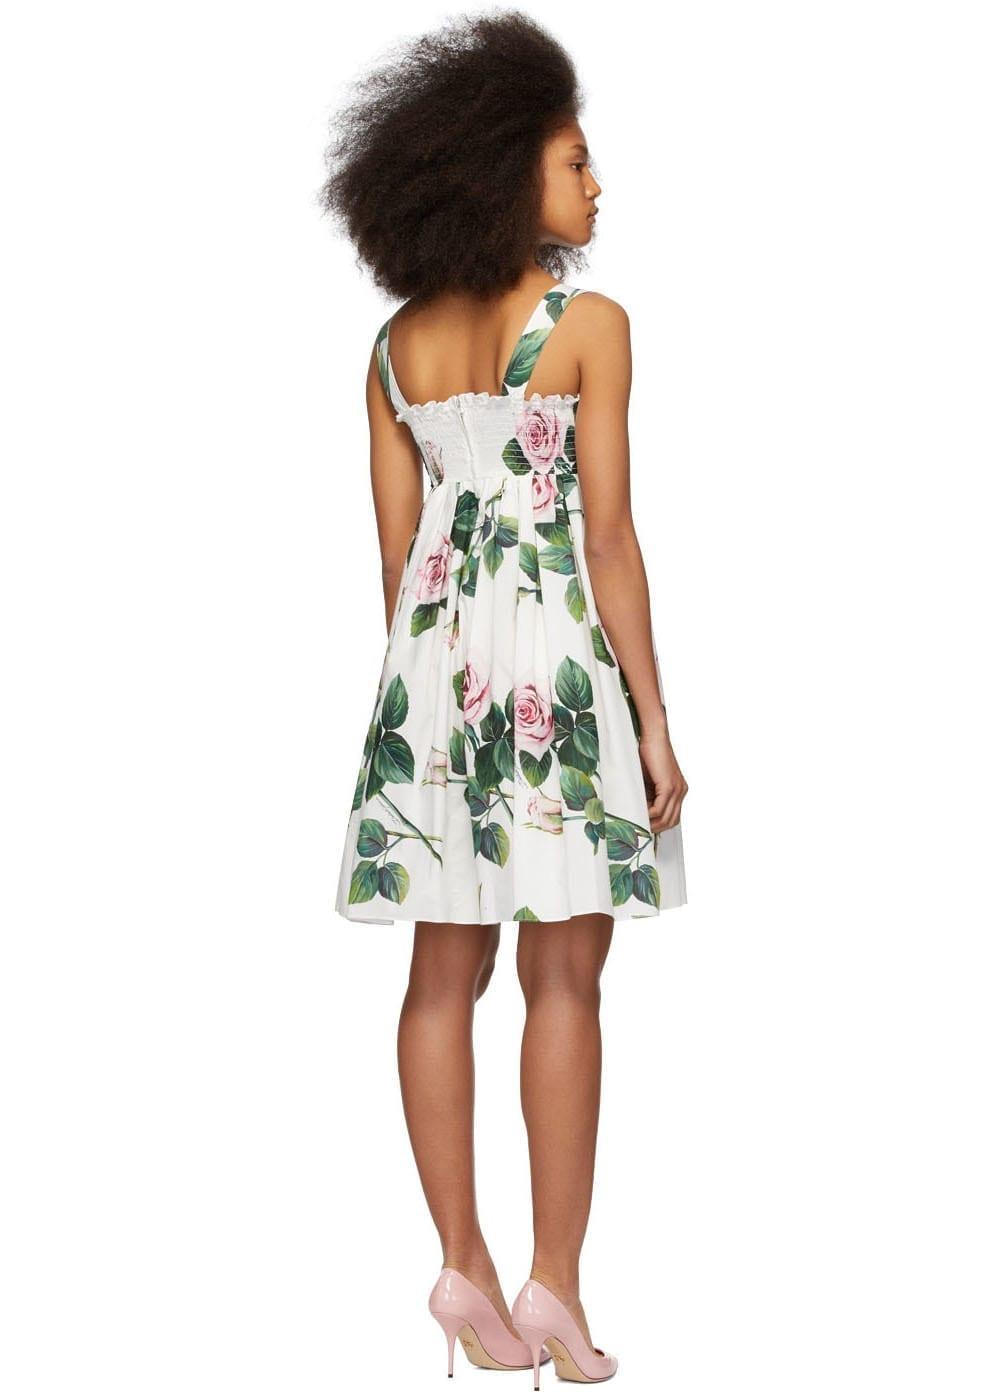 DOLCE & GABBANA Multicolor Tropical Rose Print Dress